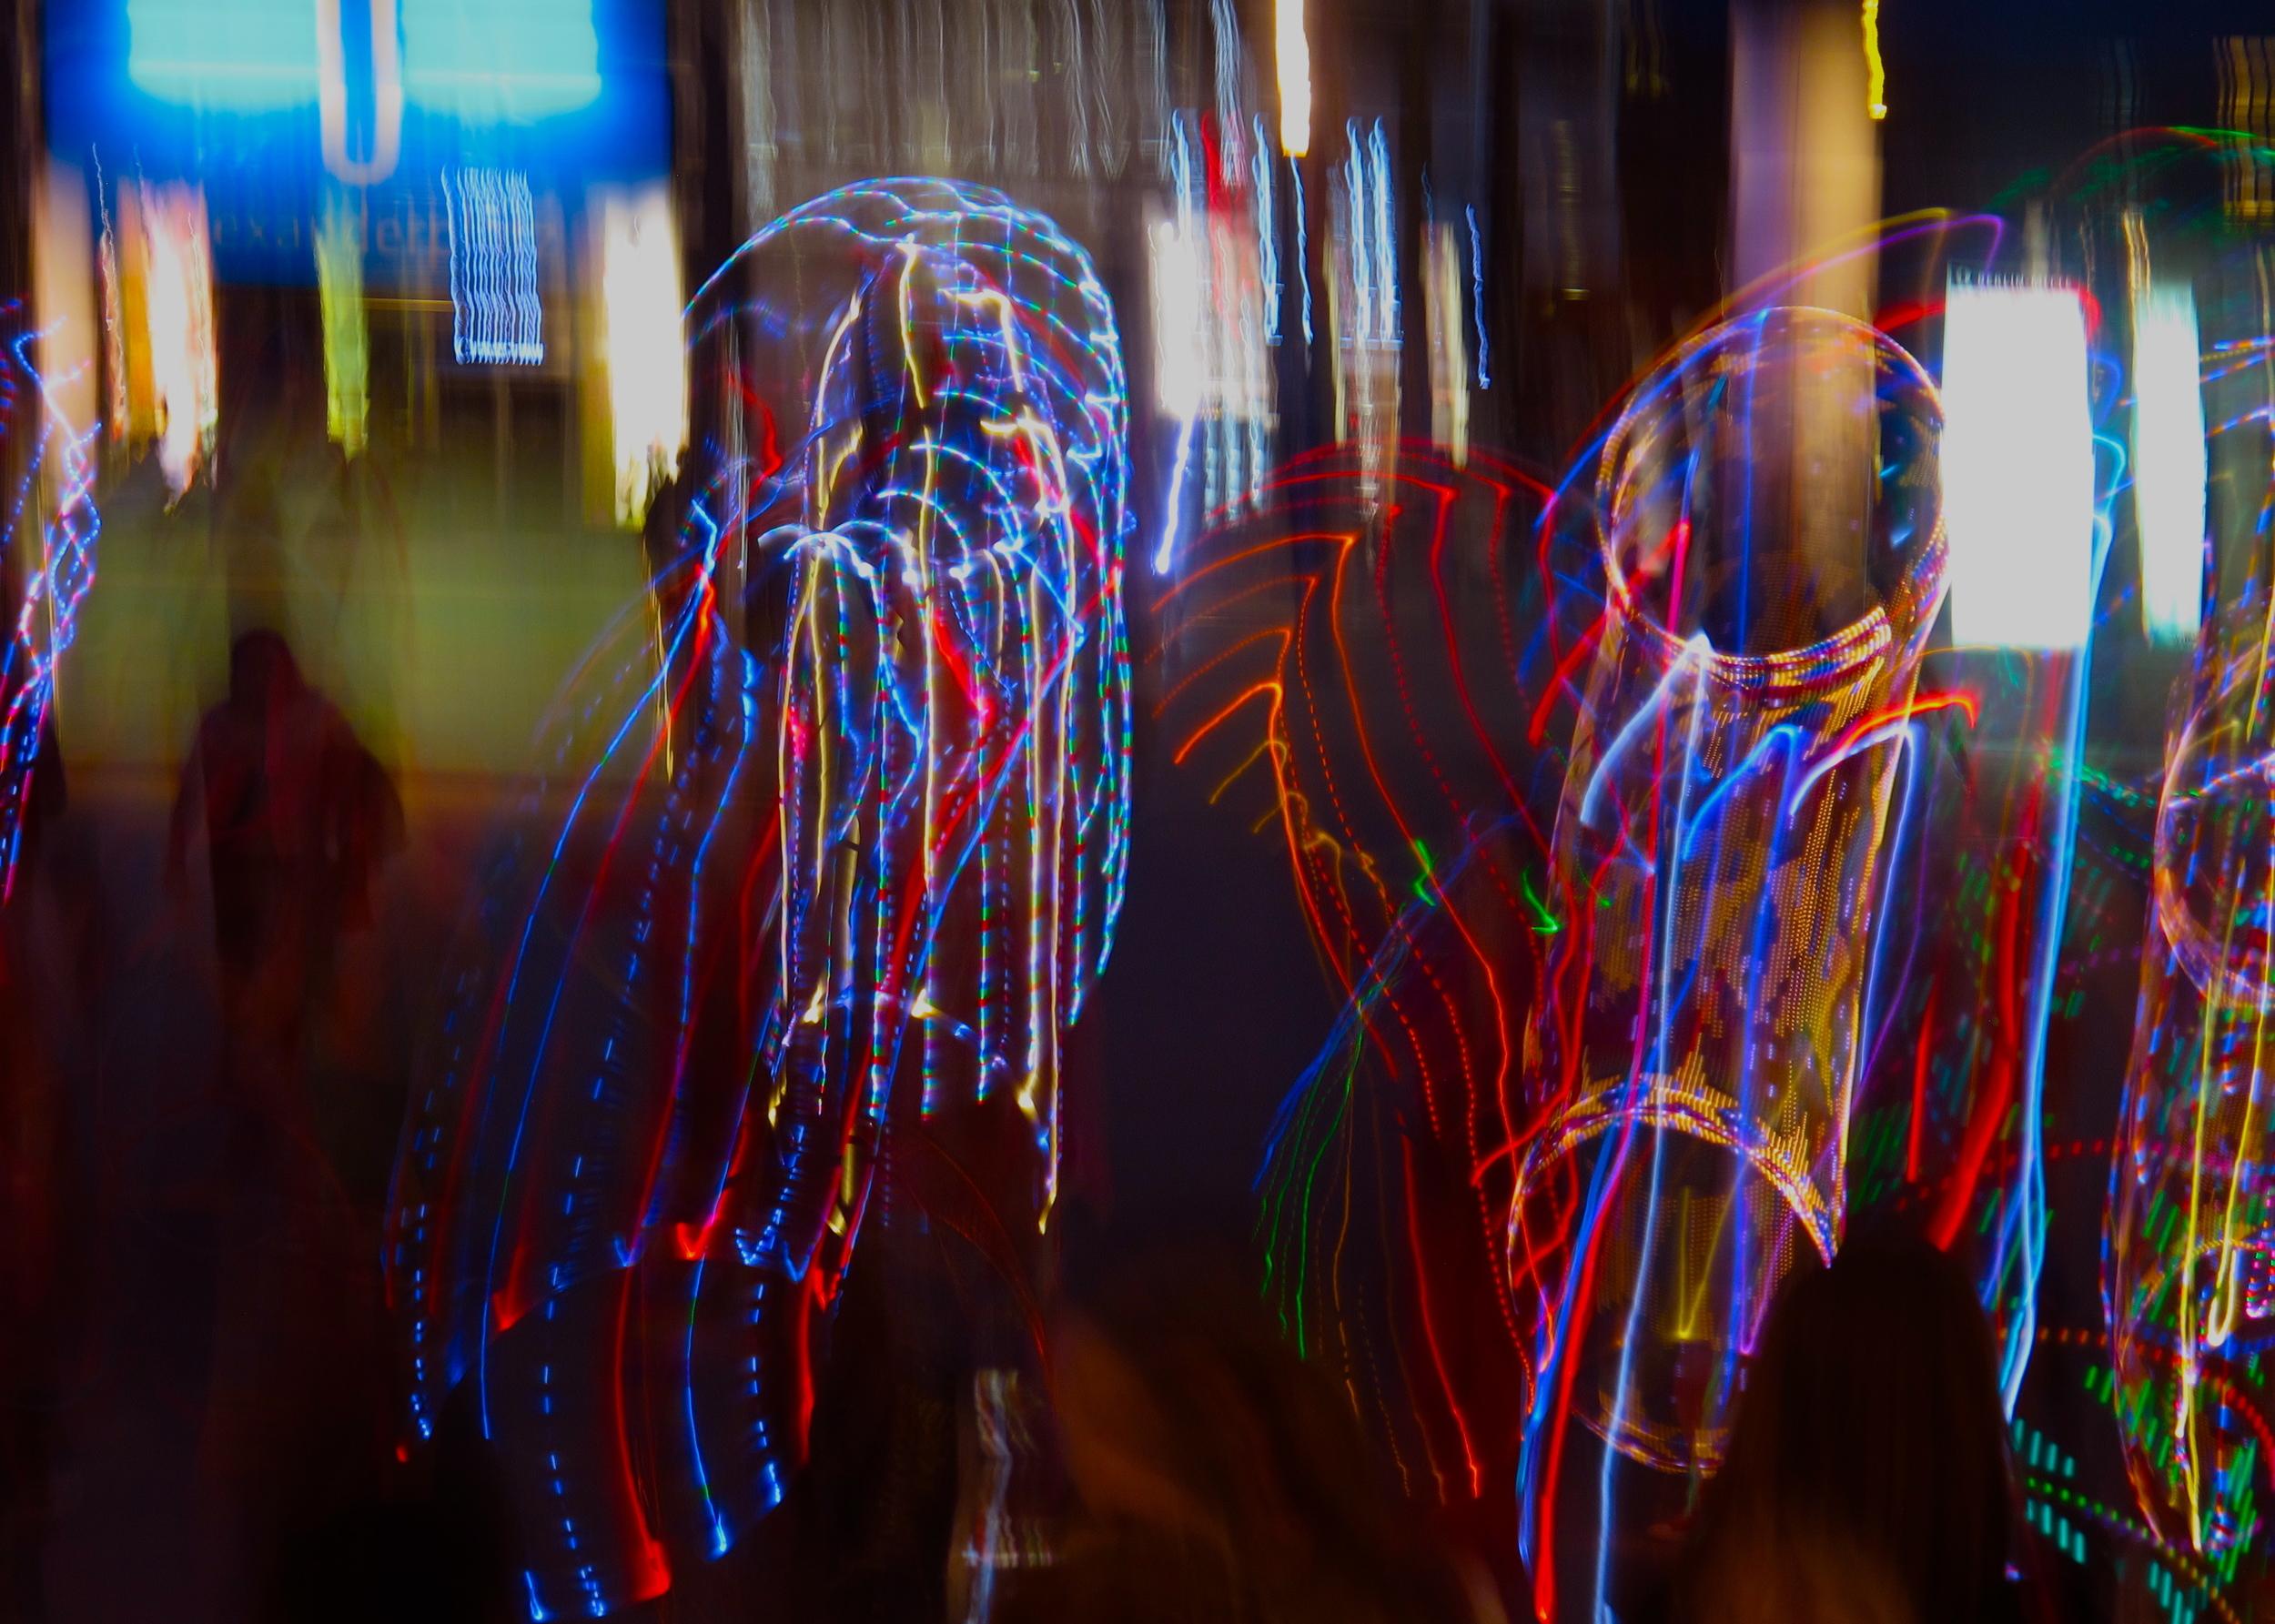 Neon Hula Hoopsters